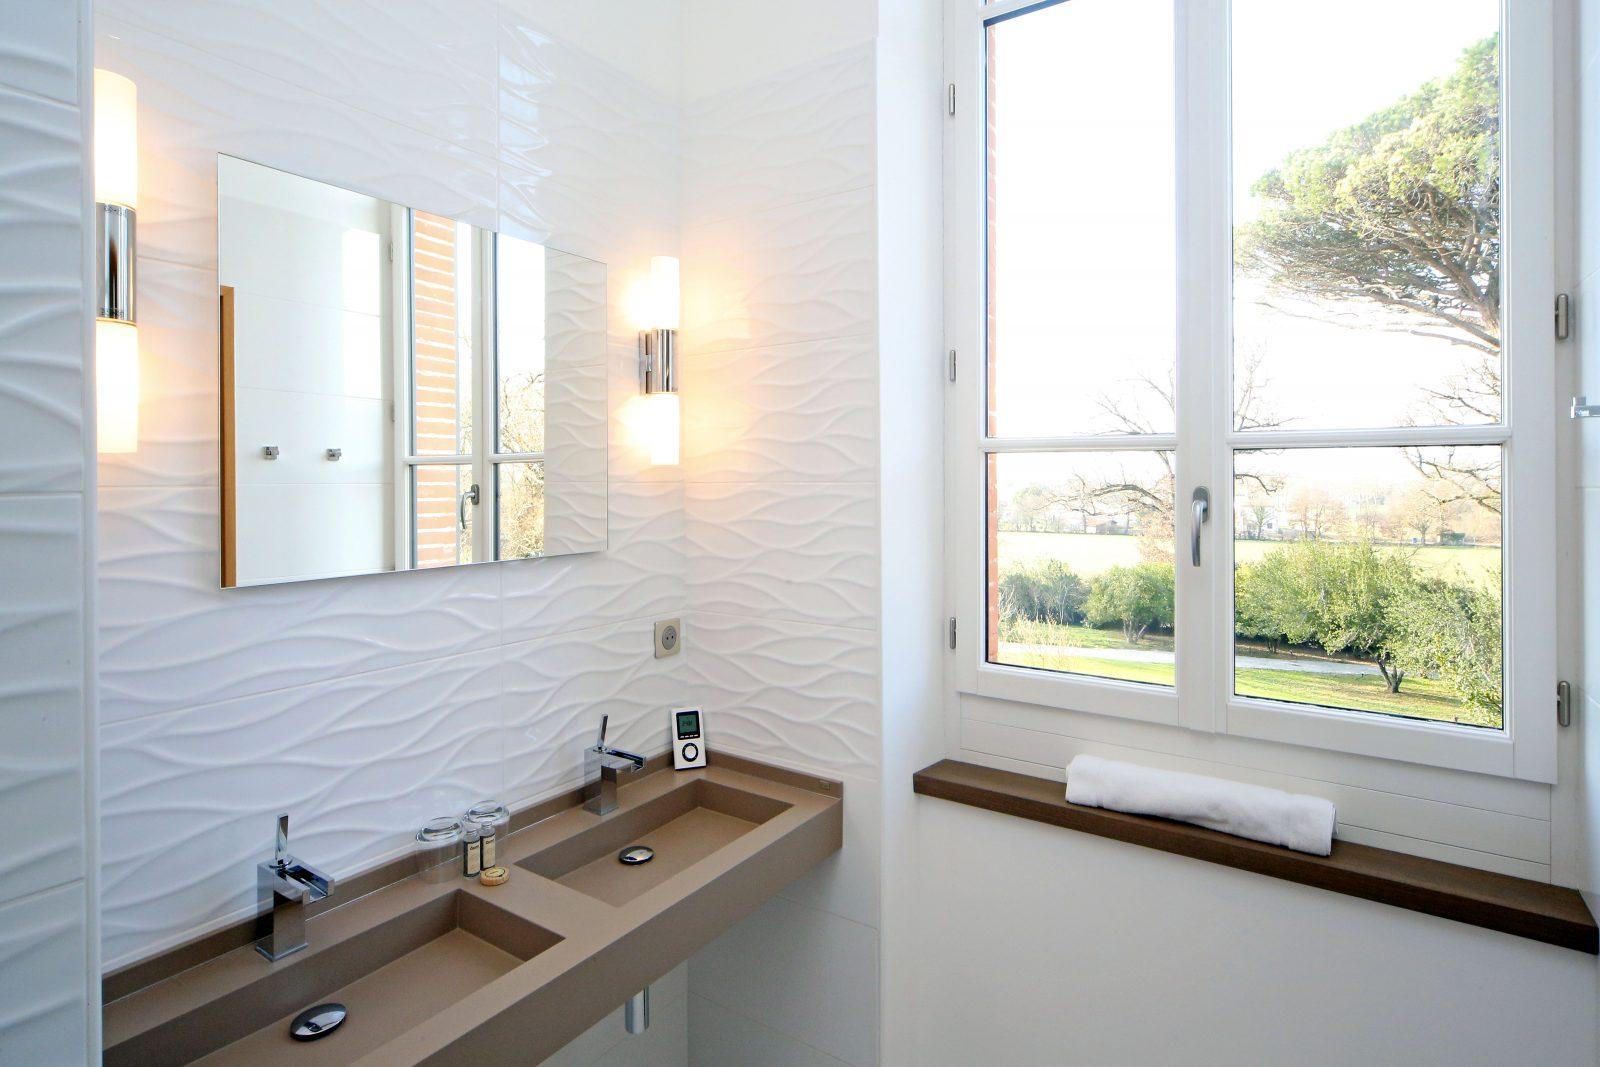 Domaine d'En Fargou – Hôtel 4* – Salle de bain chambre Or – Saint-Sulpice Tarn